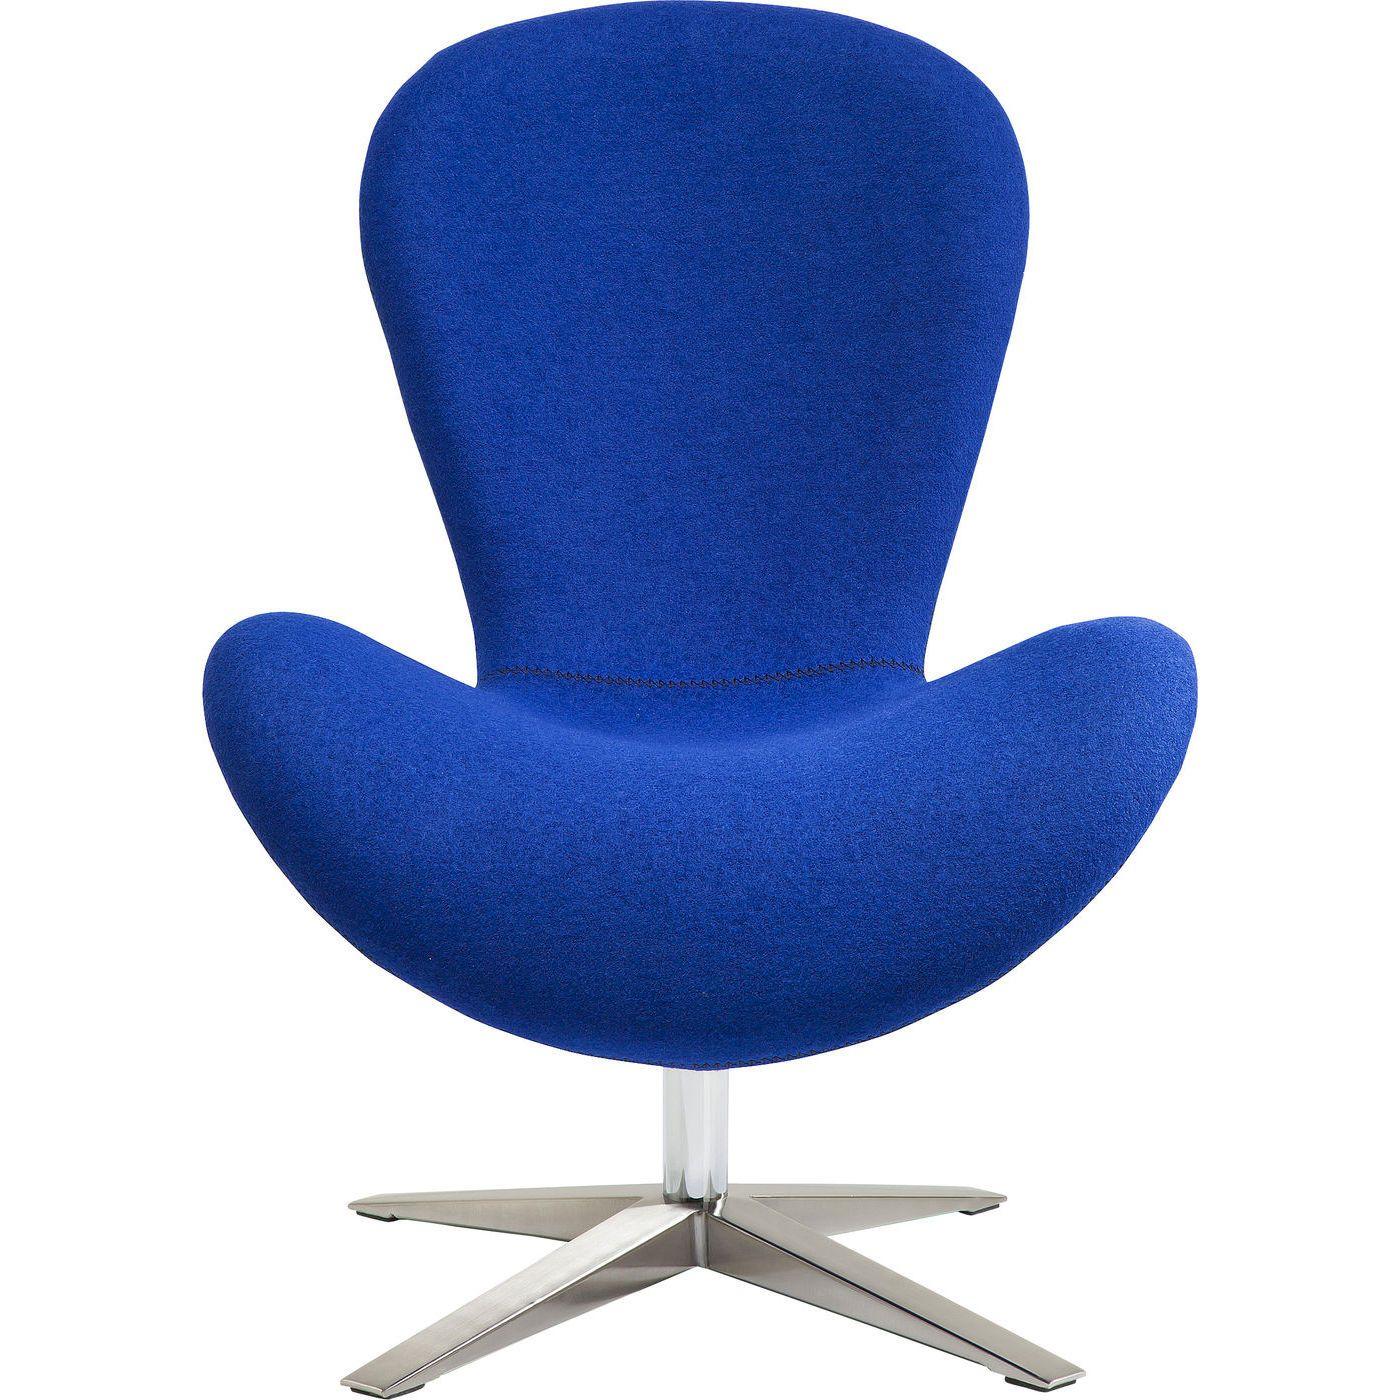 Groovy Swivel Chair Rocket Blue Unemploymentrelief Wooden Chair Designs For Living Room Unemploymentrelieforg